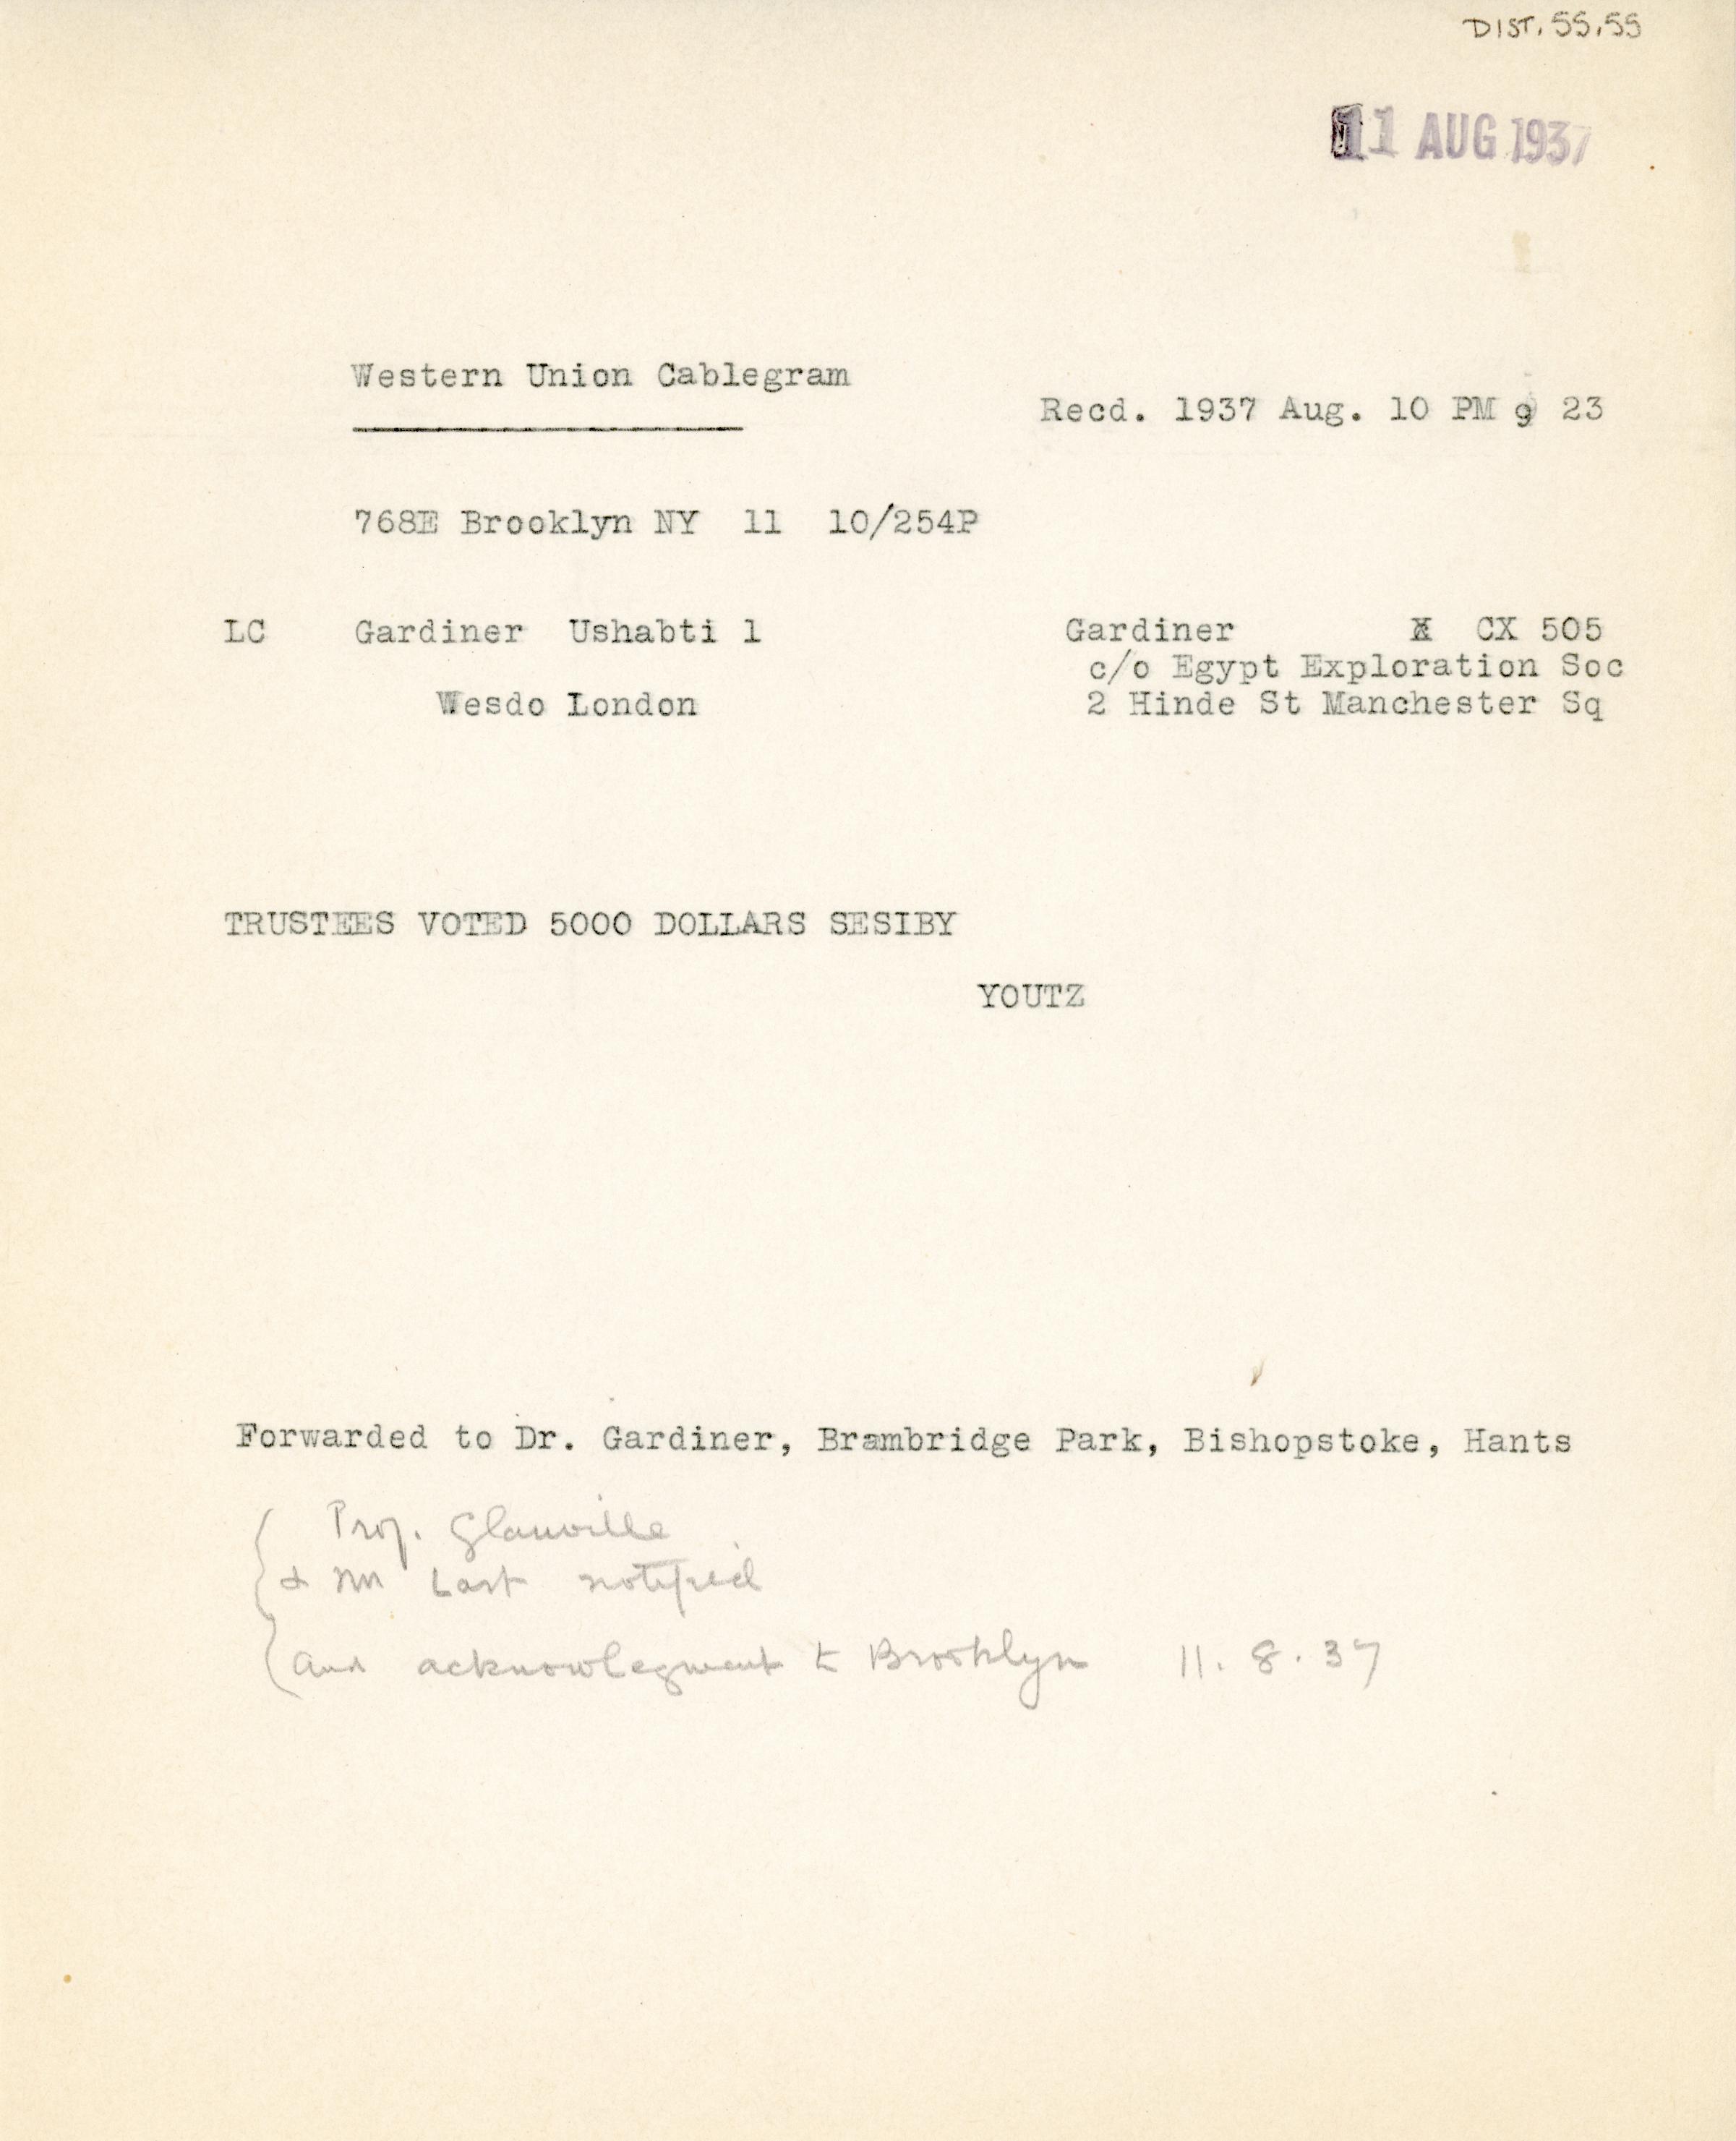 1931-44 Brooklyn Museum DIST.55.55